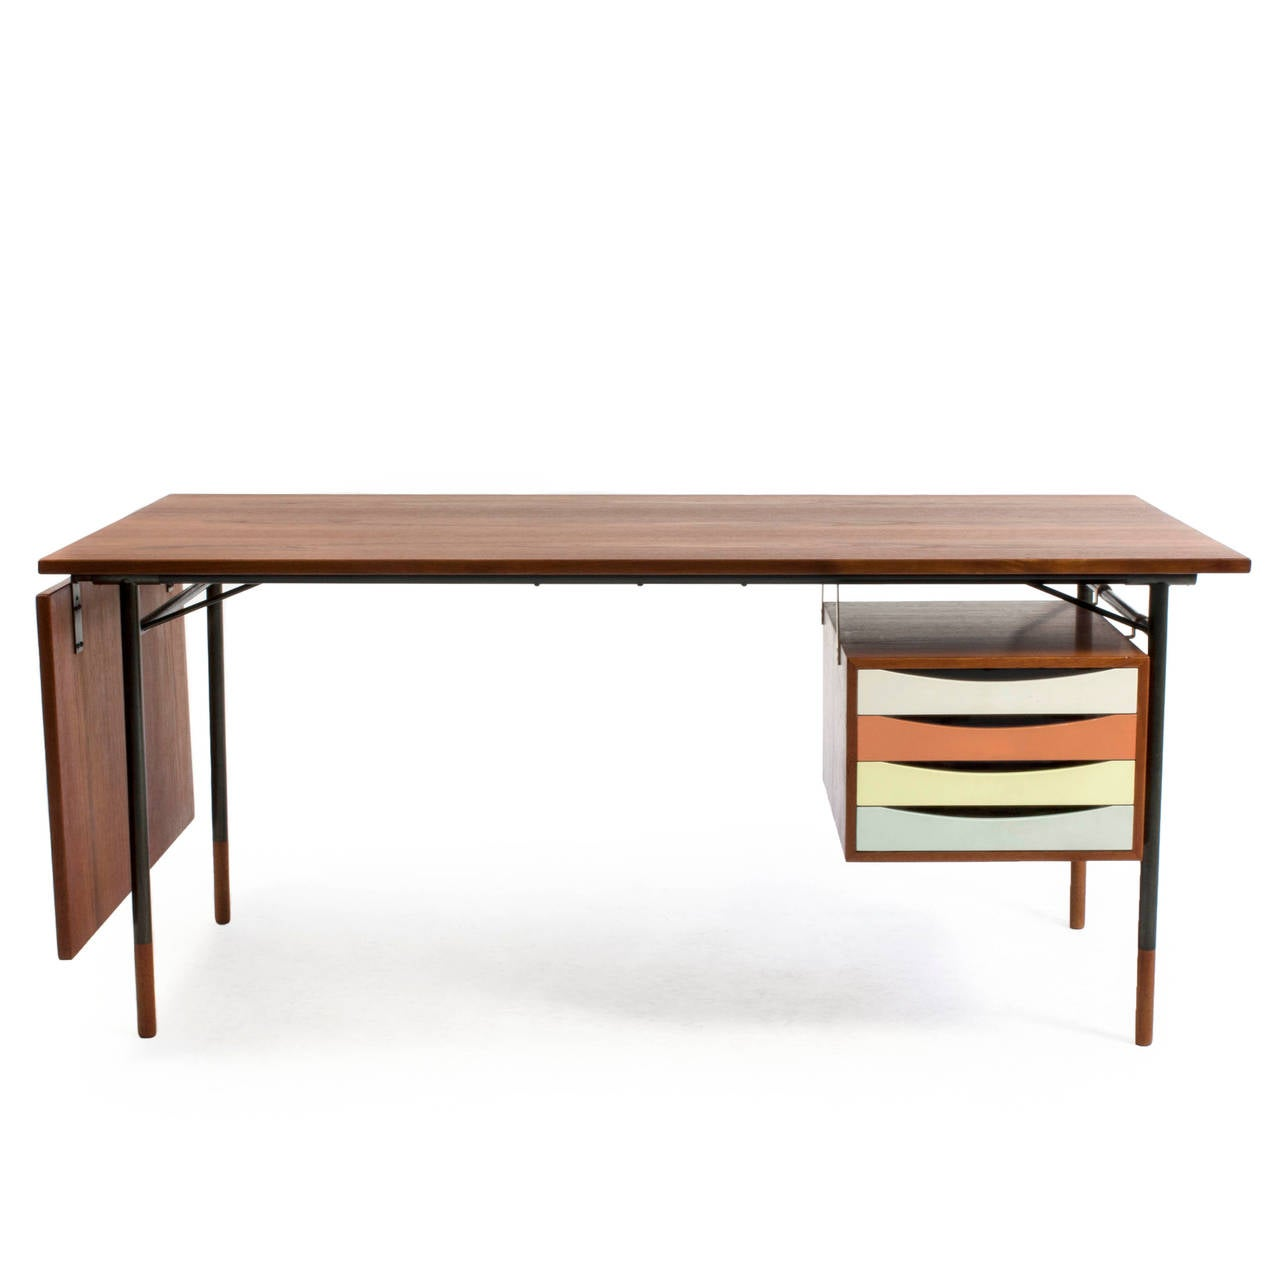 A rare freestanding Finn Juhl teak desk with colored drawers and detachable flip-down leaf.   Drawer section, tabletop and shoes of teak, frame of gunmetal.   Designed by Finn Juhl 1953 and manufactured by Bovirke, Denmark, model BO 69.   Burn